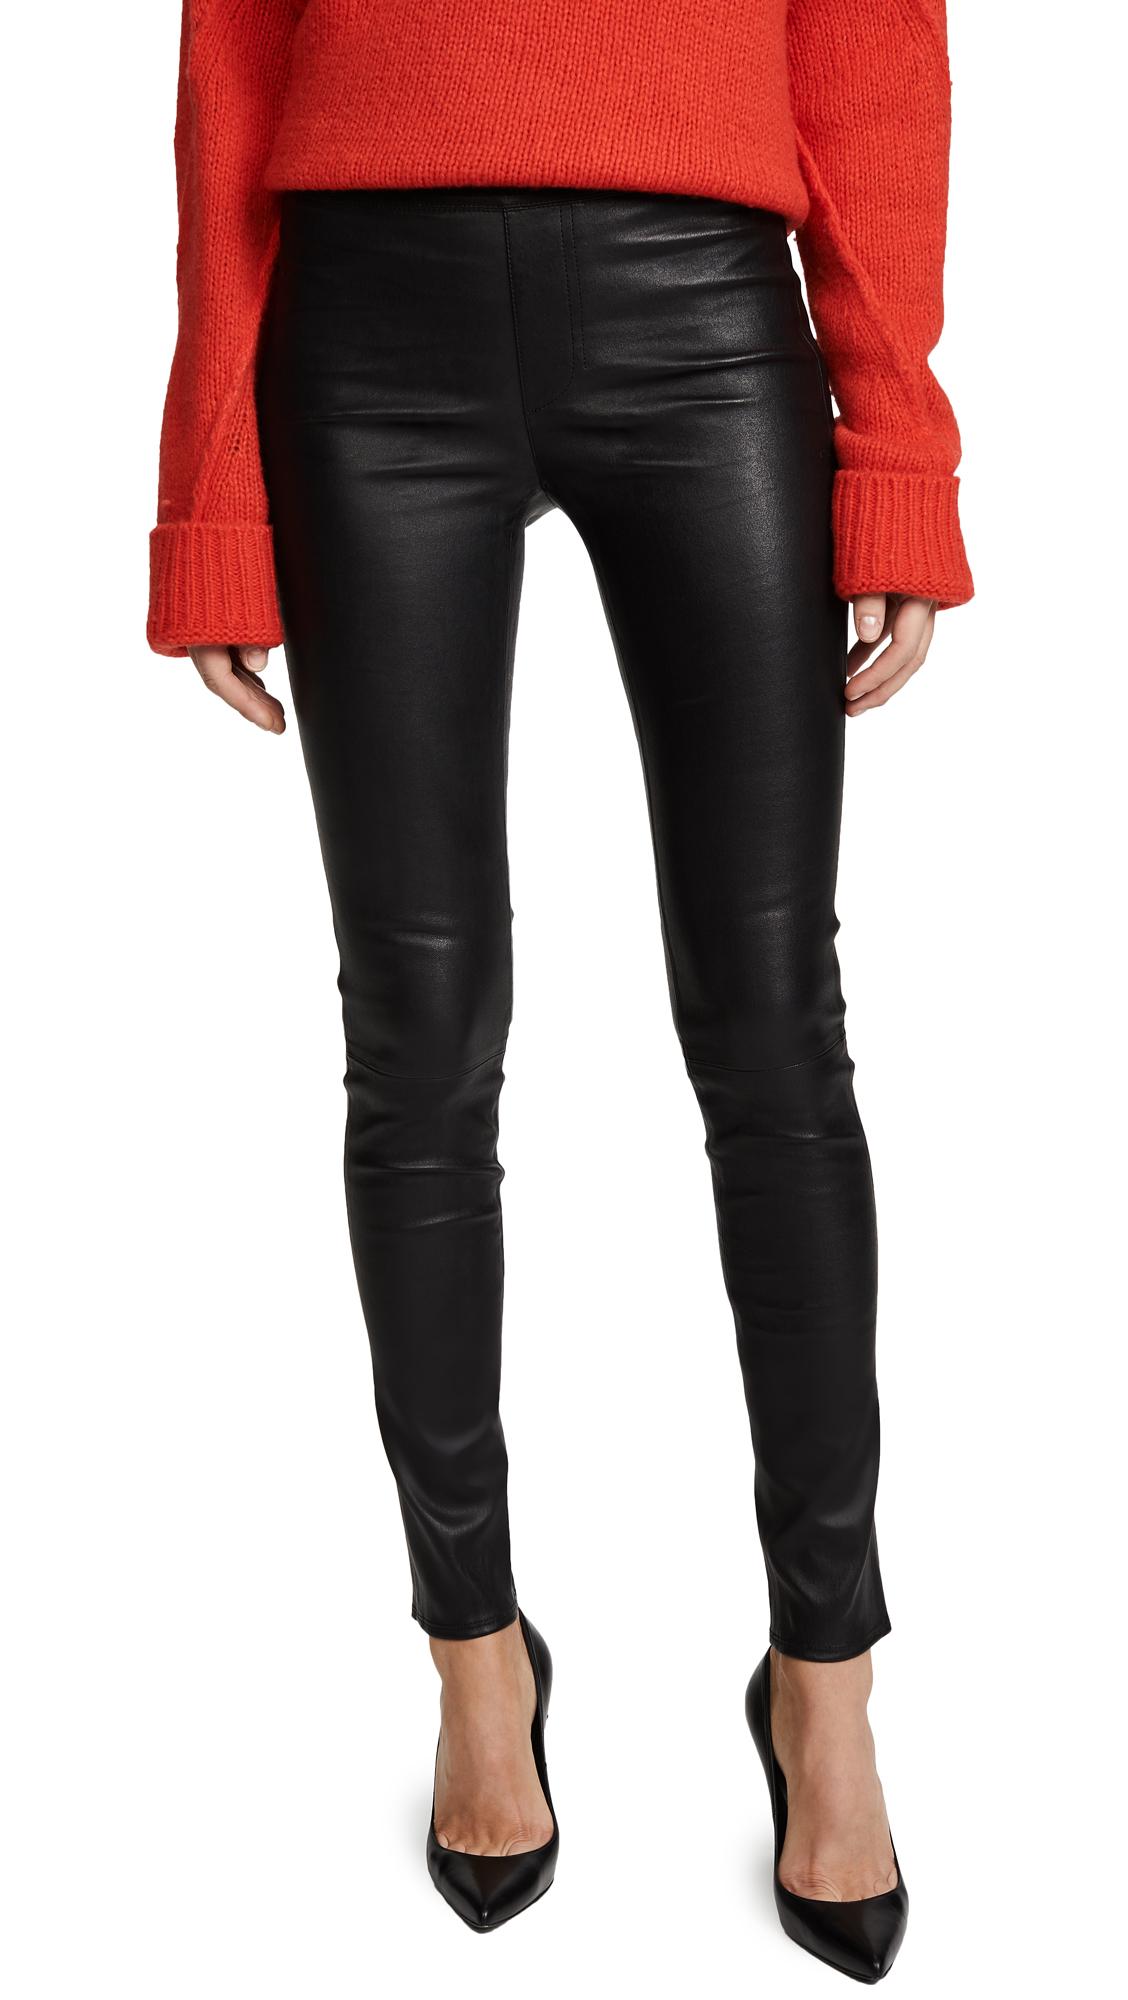 Helmut Lang Leather Leggings - Black